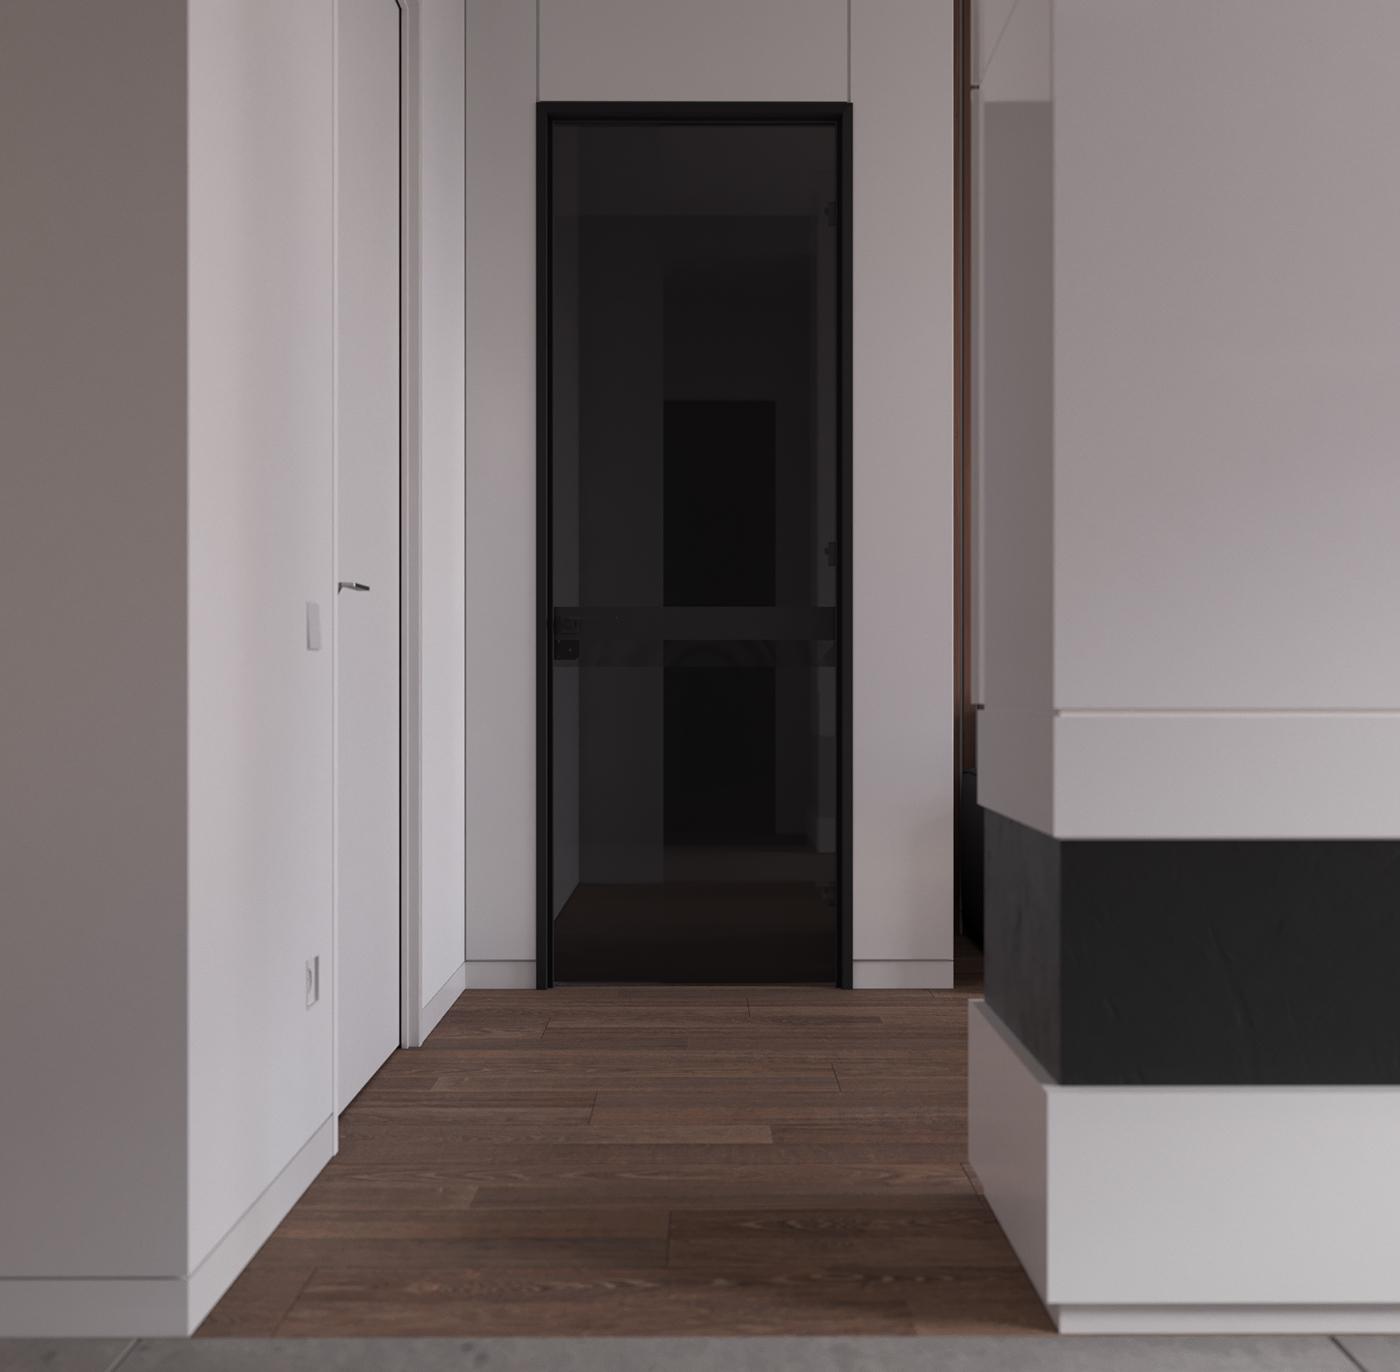 Interior minimalist minimalist design contemporary interior saym architects visualization Architecture Visualization corona renderer